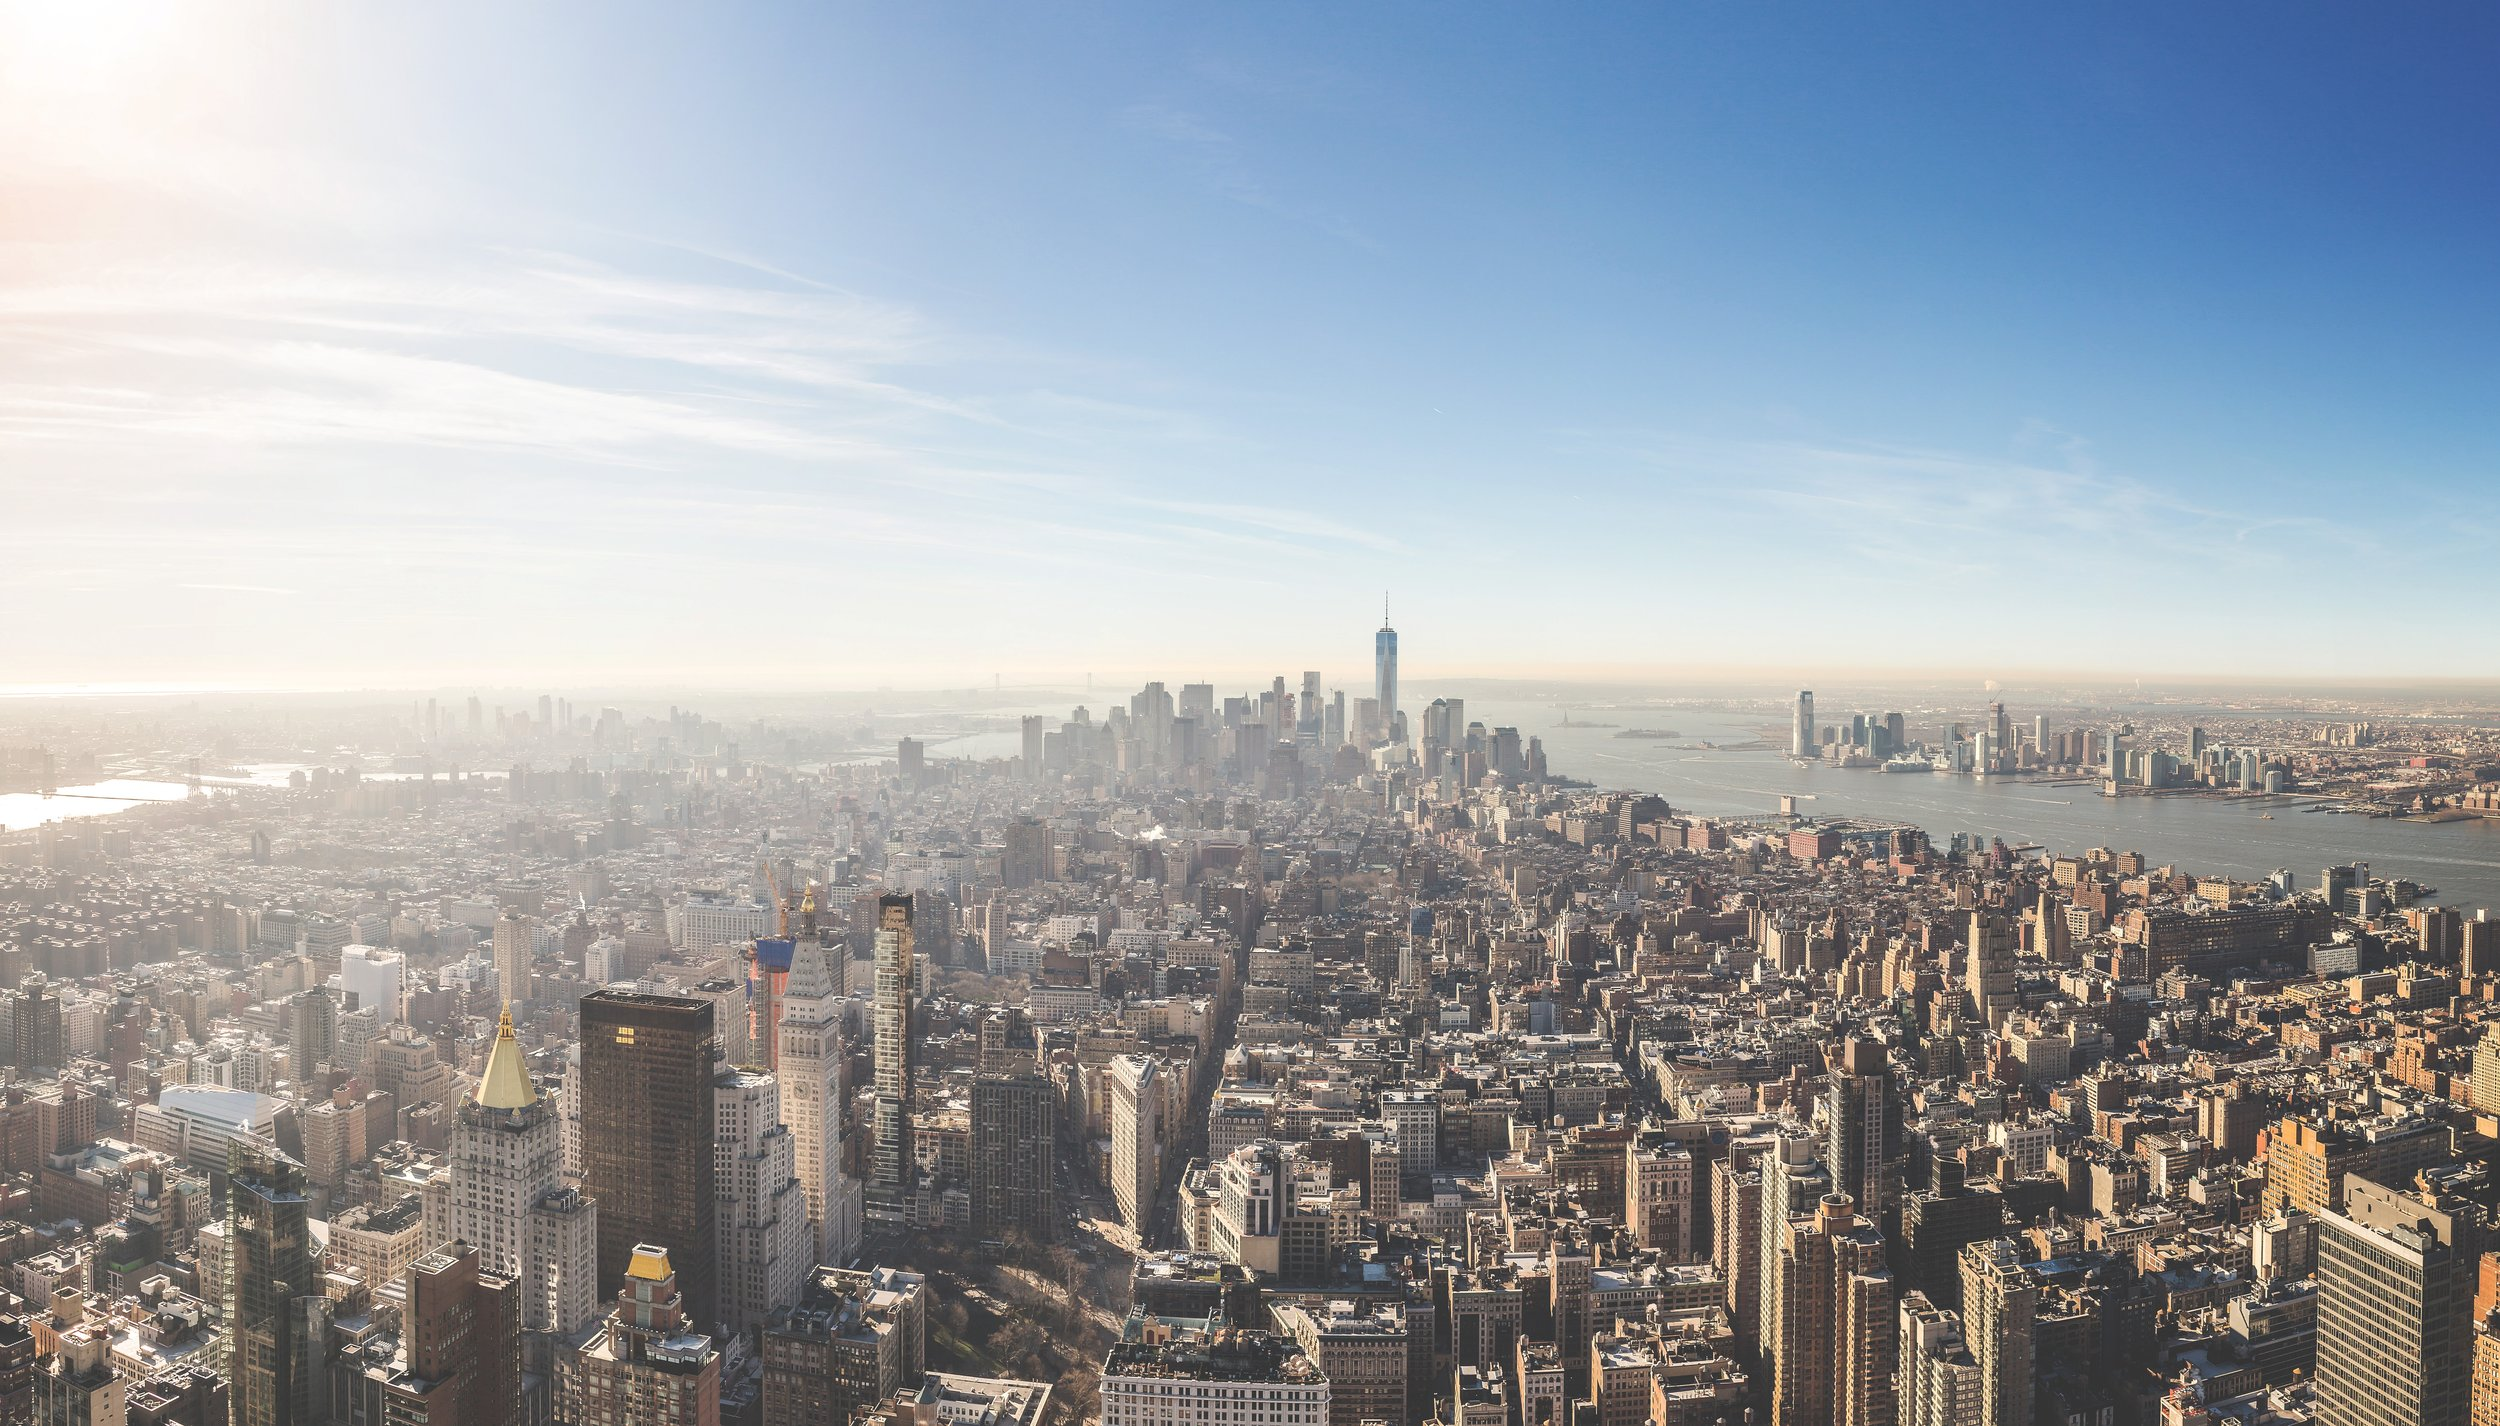 Manhattan view, uptown to downtown